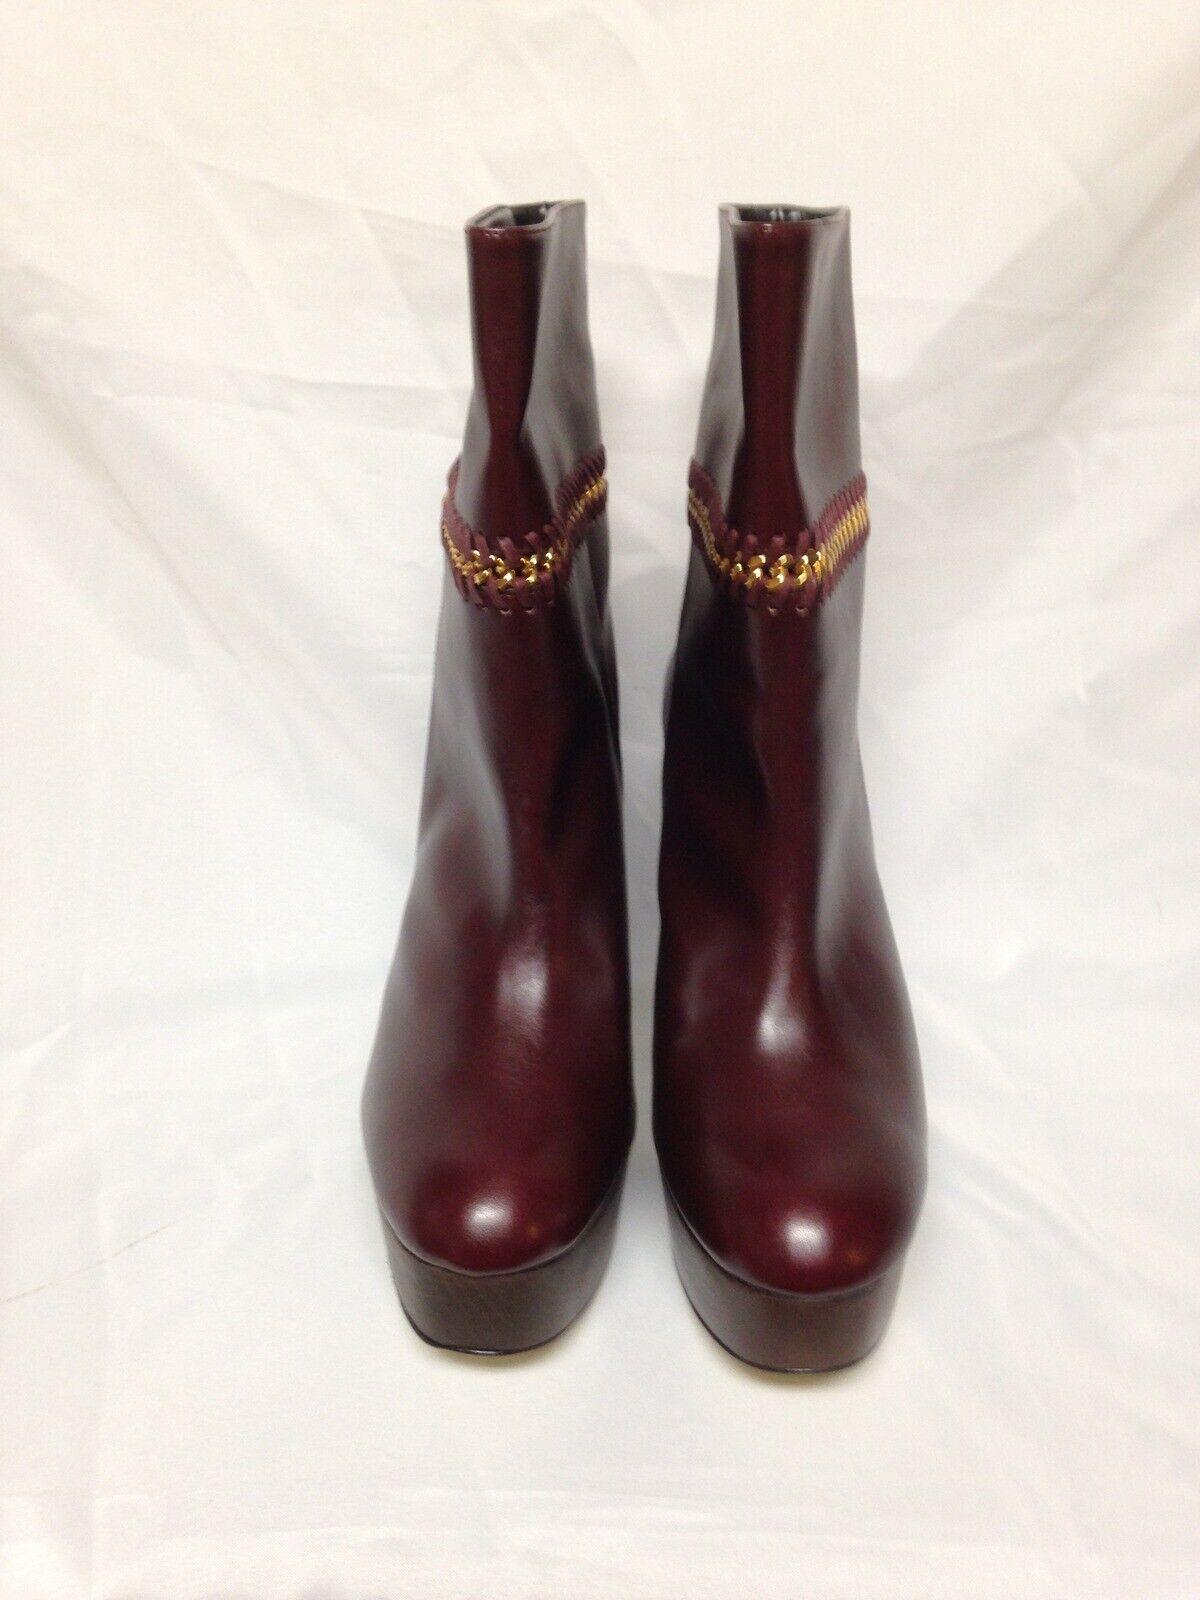 Stella McCartney Chain Embellished Faux Leather 41 US 11 Plum Barolo NIB